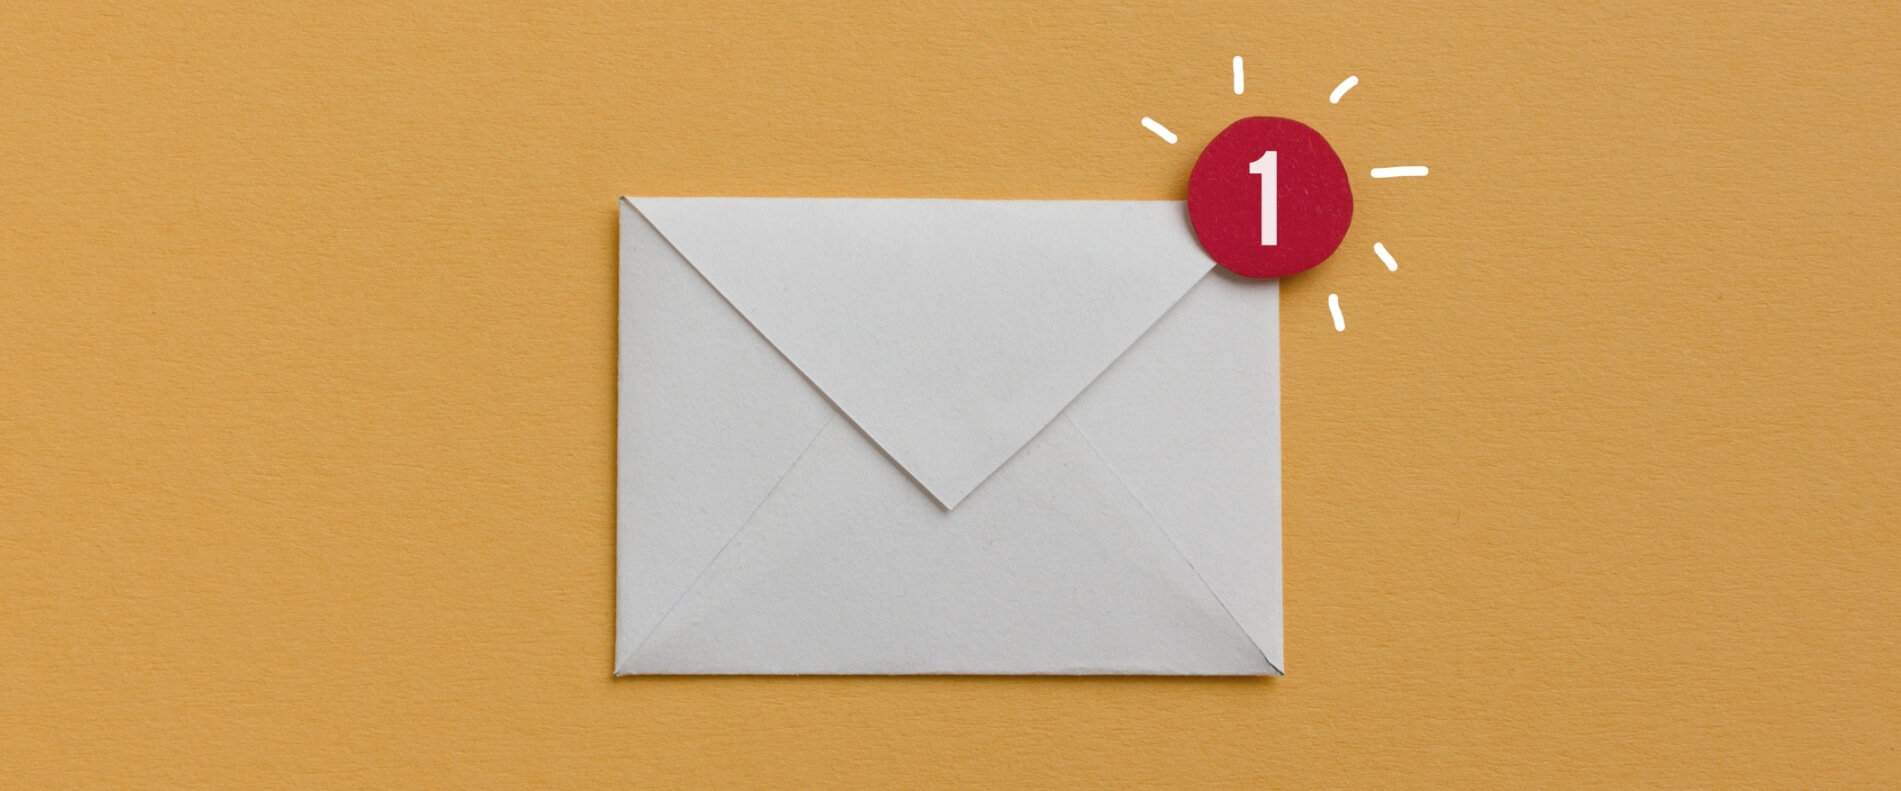 webinar five secrets email marketing geniuses